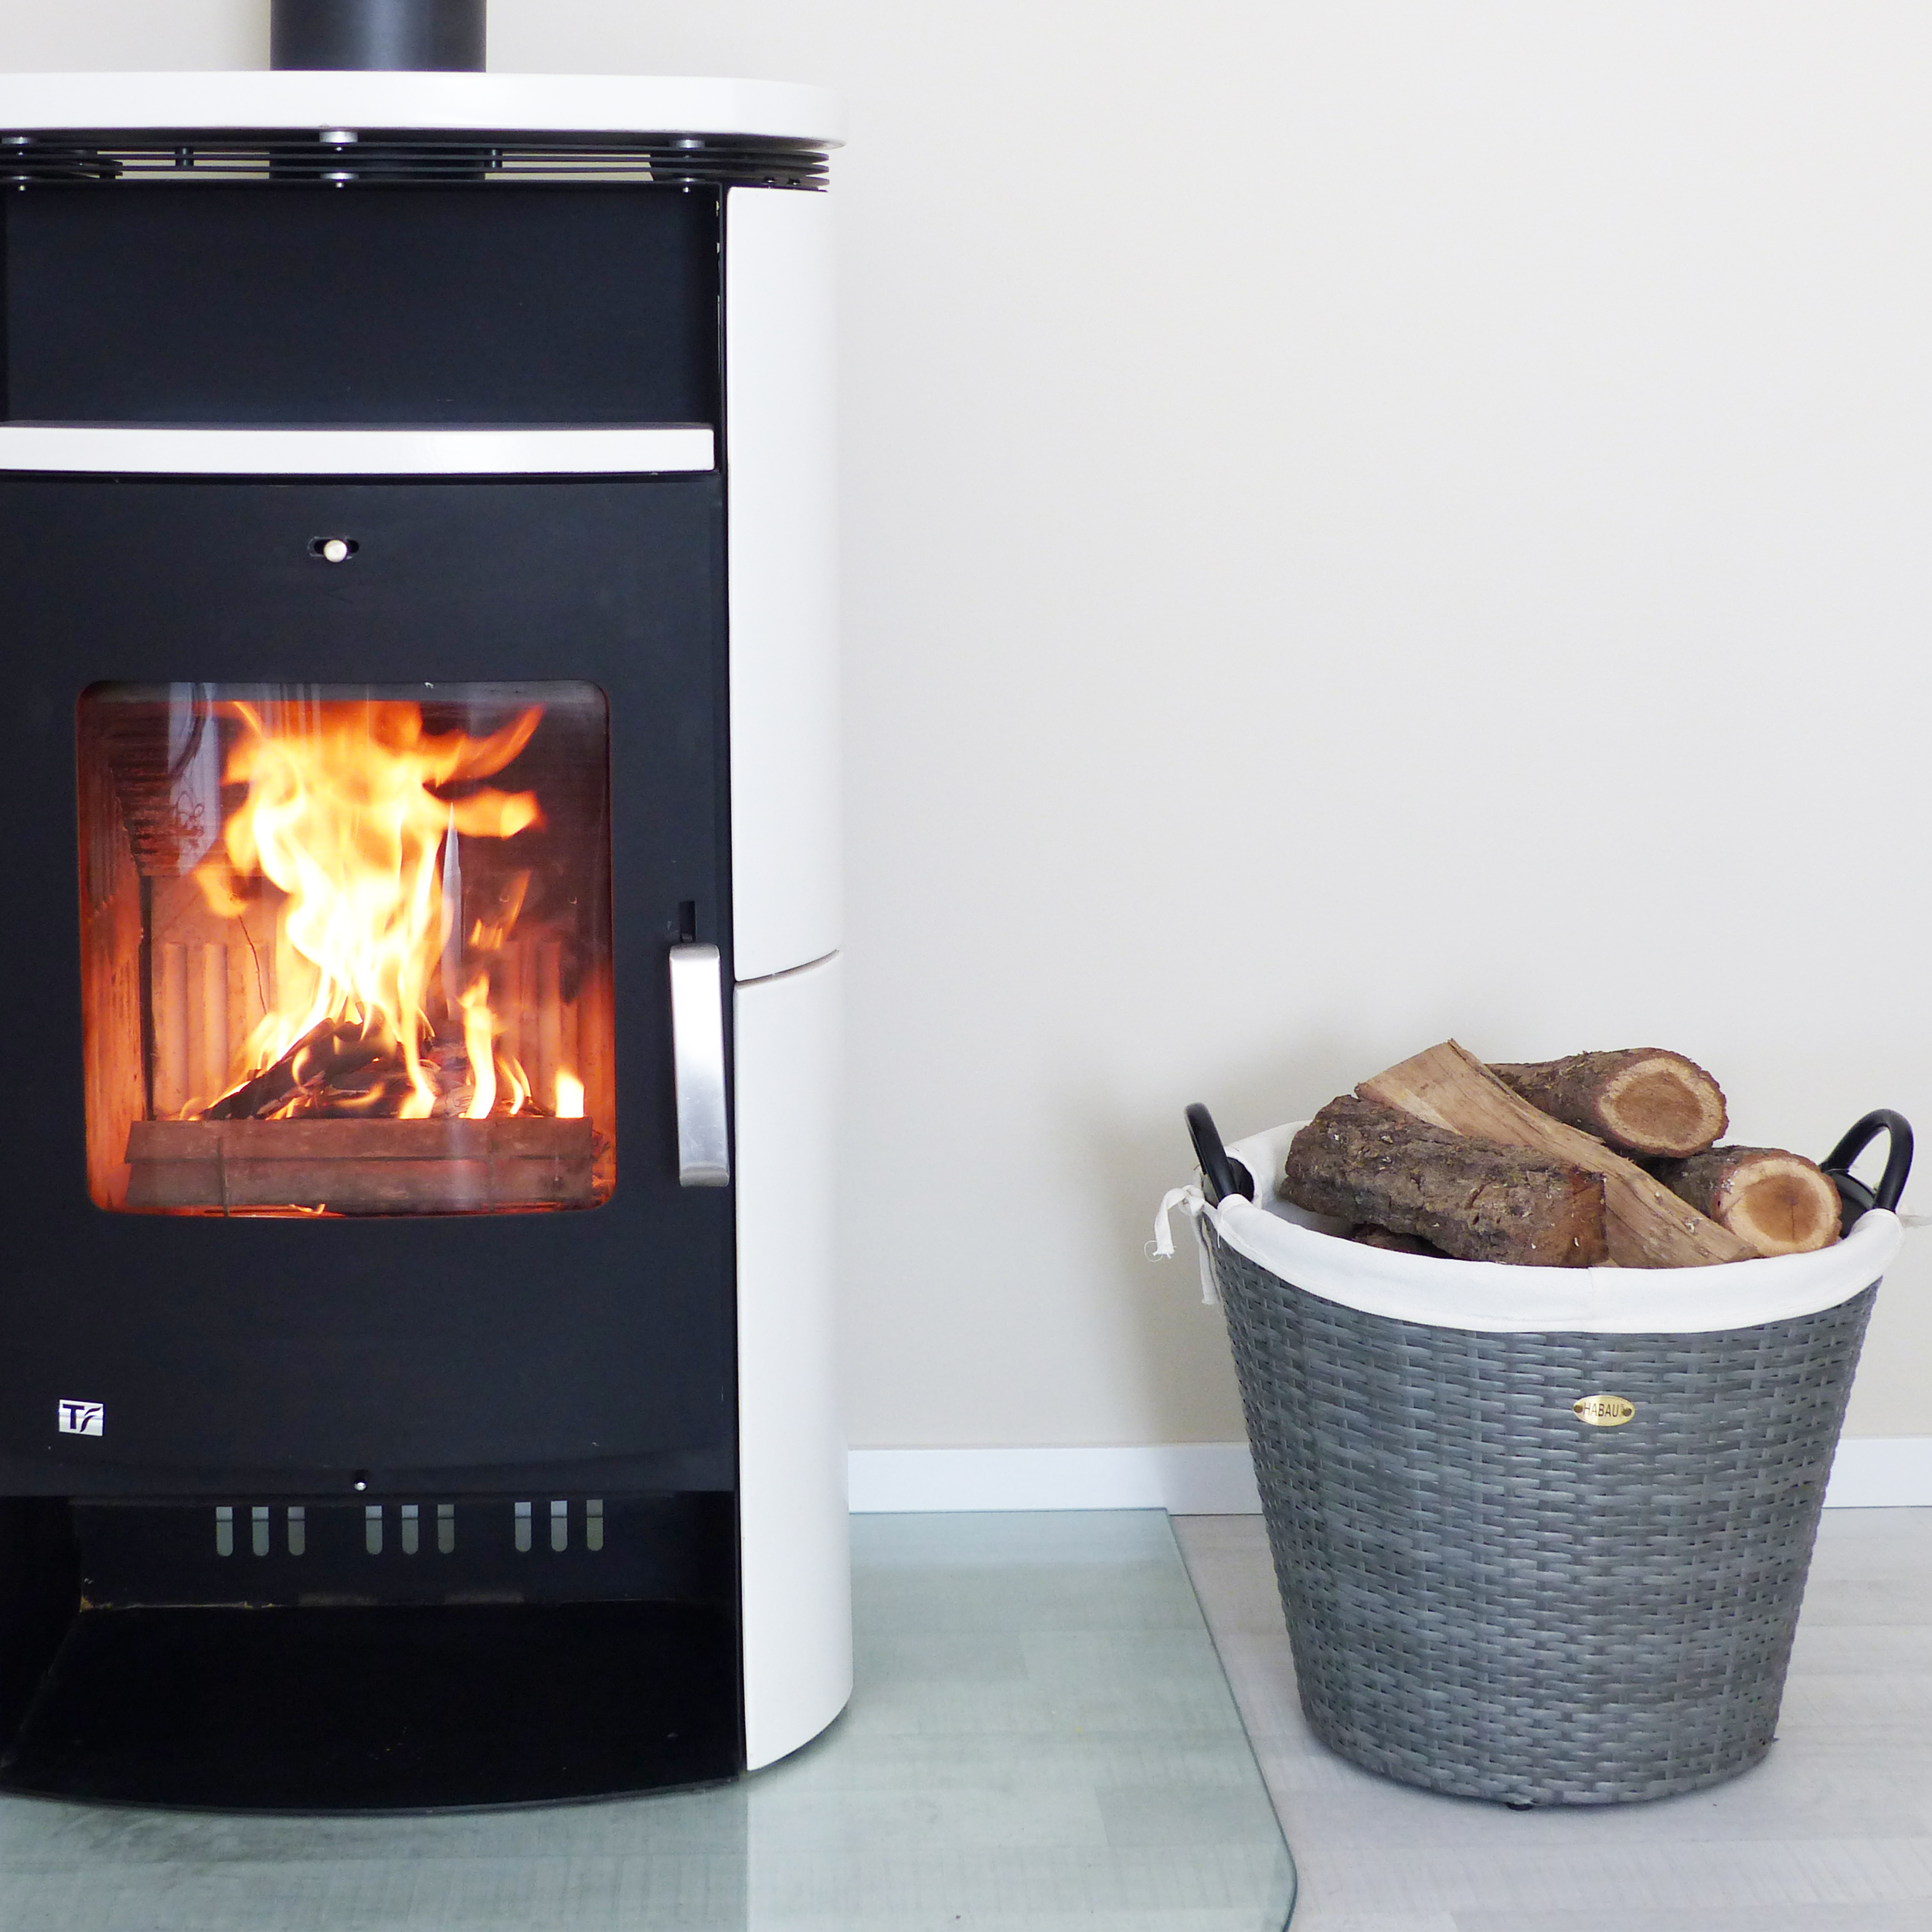 HABAU Feuerholzkorb aus Polyethylen - Anwendungsbeispiel - 2724